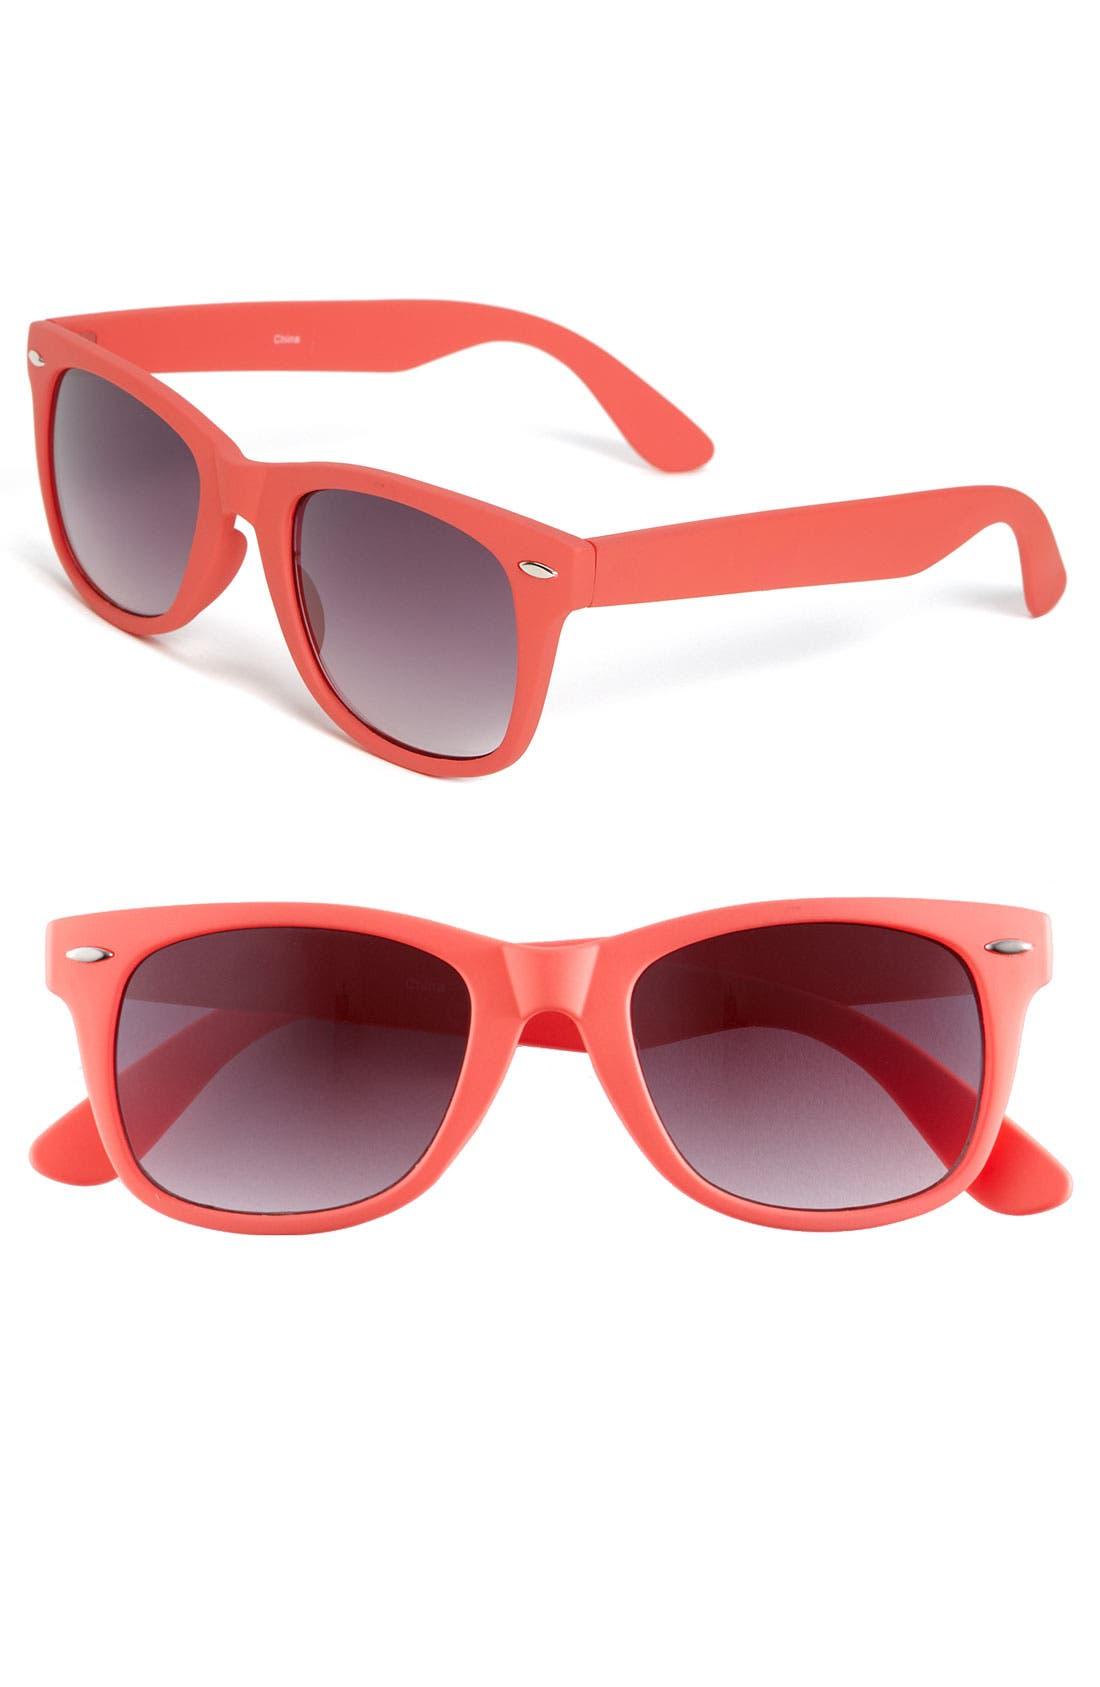 Main Image - Icon Eyewear 'Maureen' Sunglasses (2 for $20)